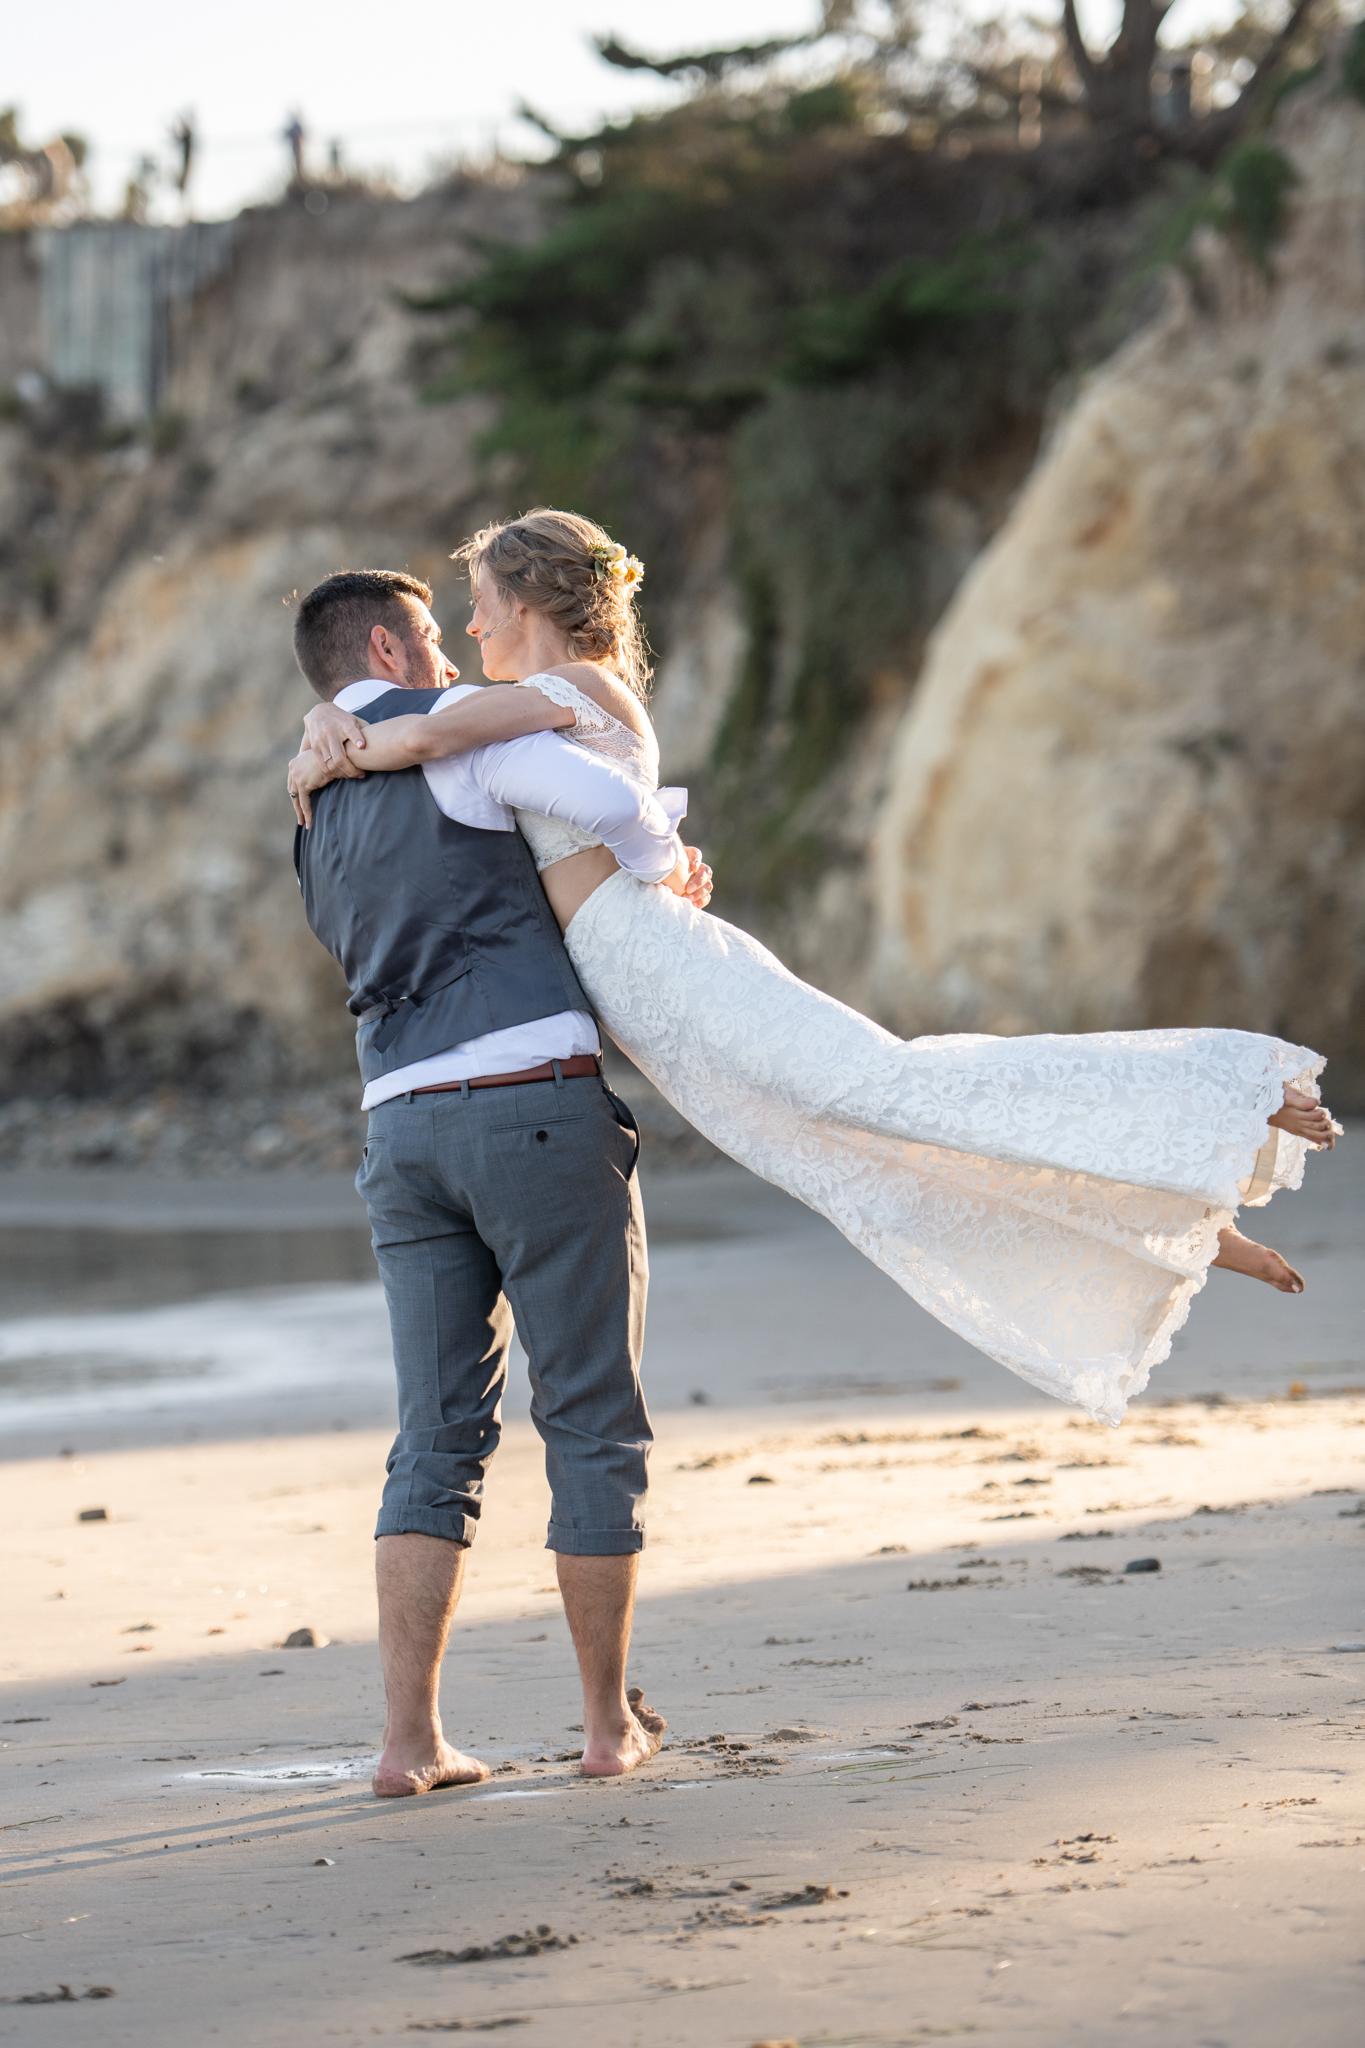 71_PRVW_Jenny_Ken_Wedding_Trevor_Hooper_Photo.jpg